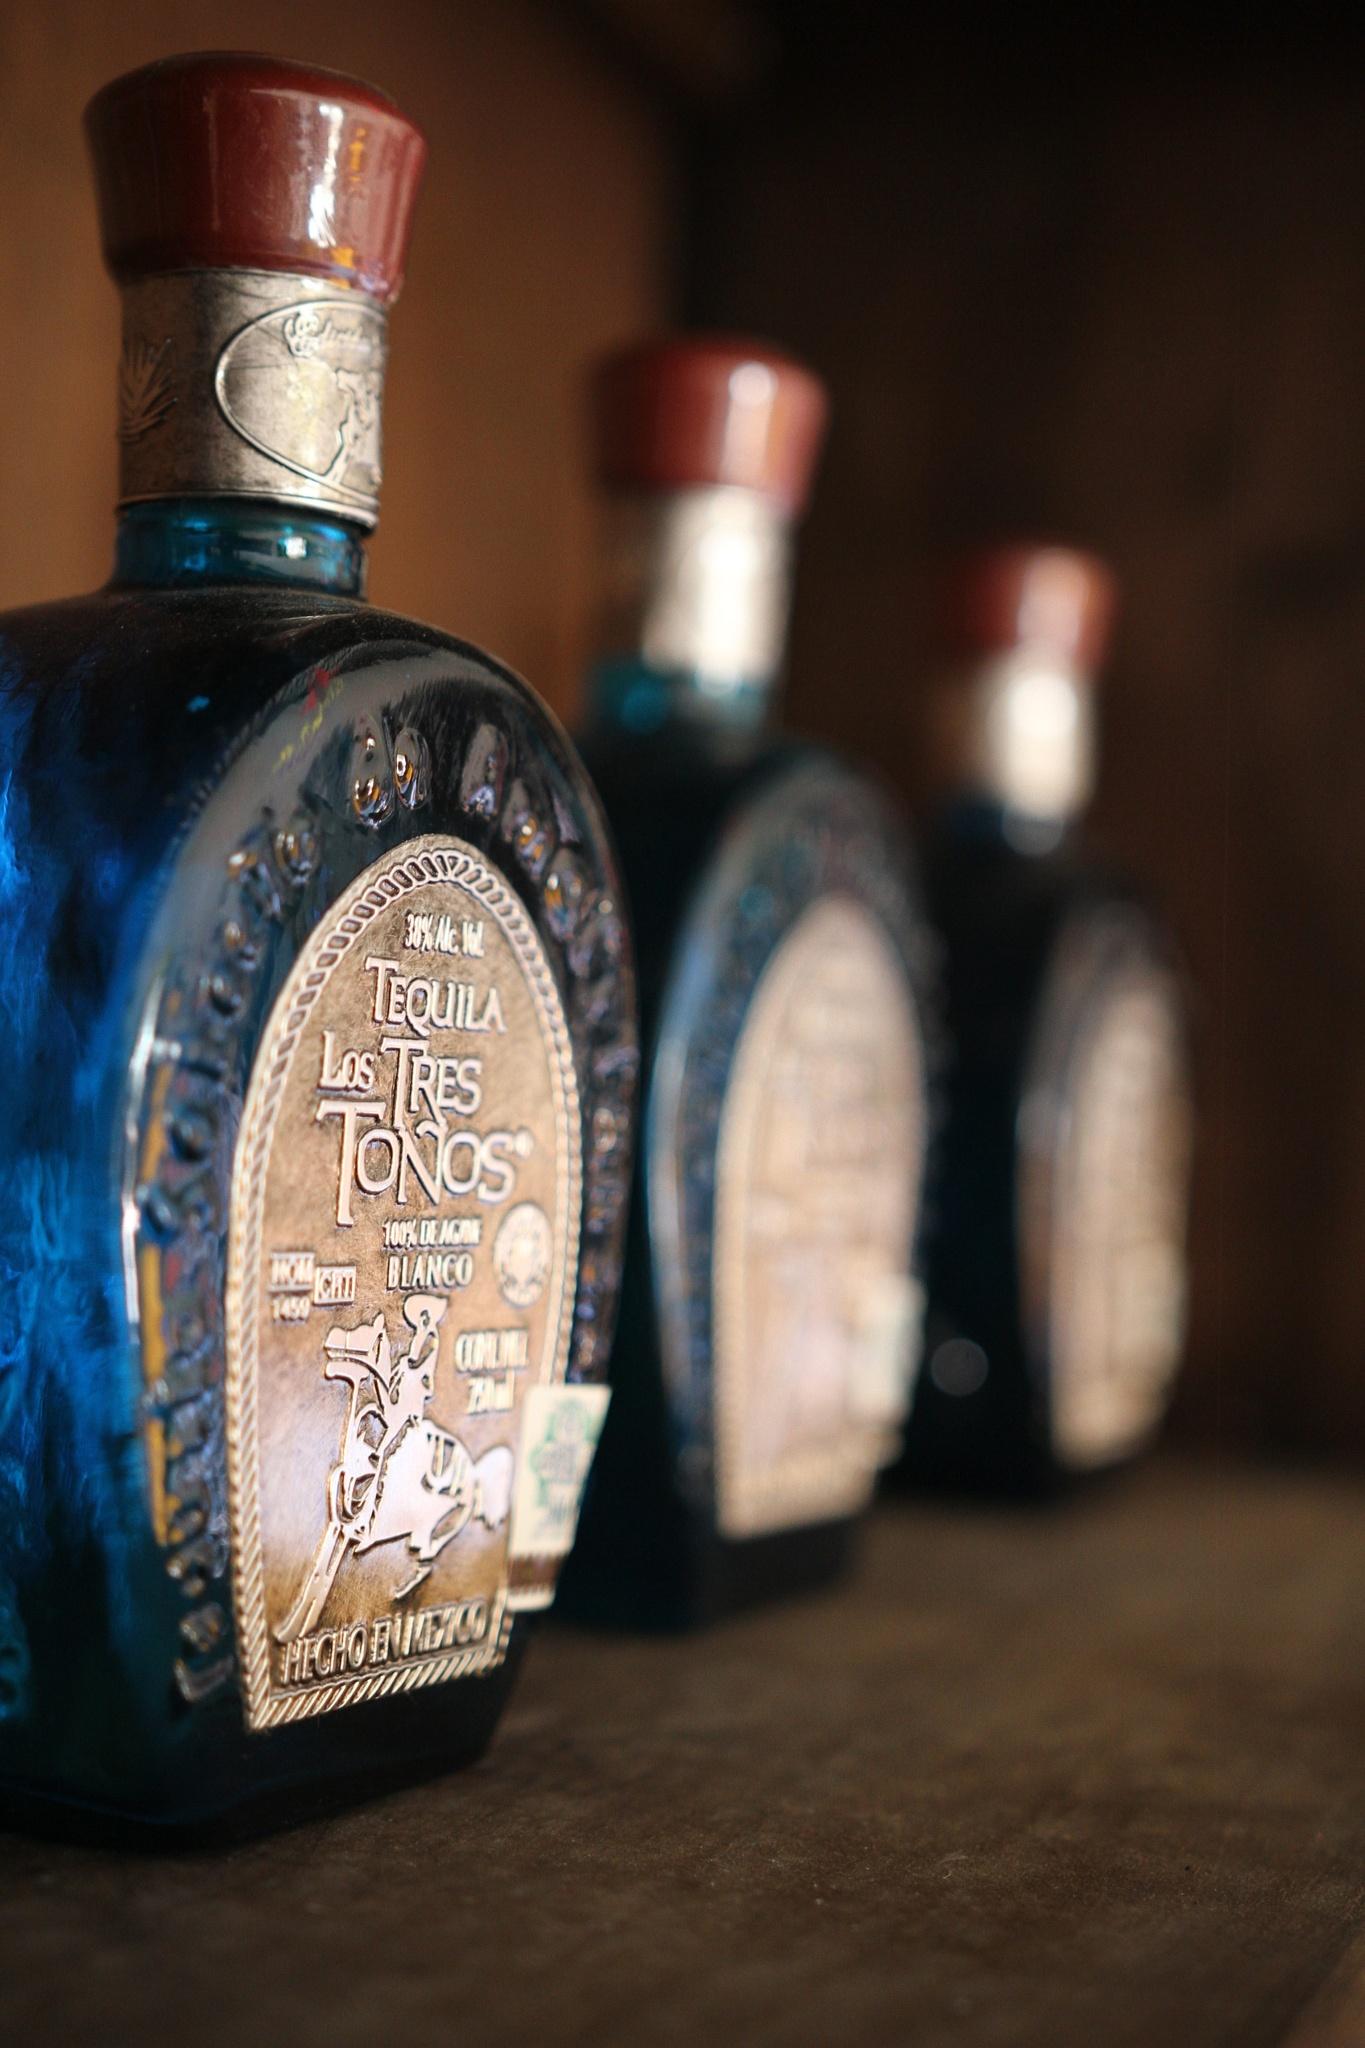 Tequila Los Tres Tonos by Blake Fruia